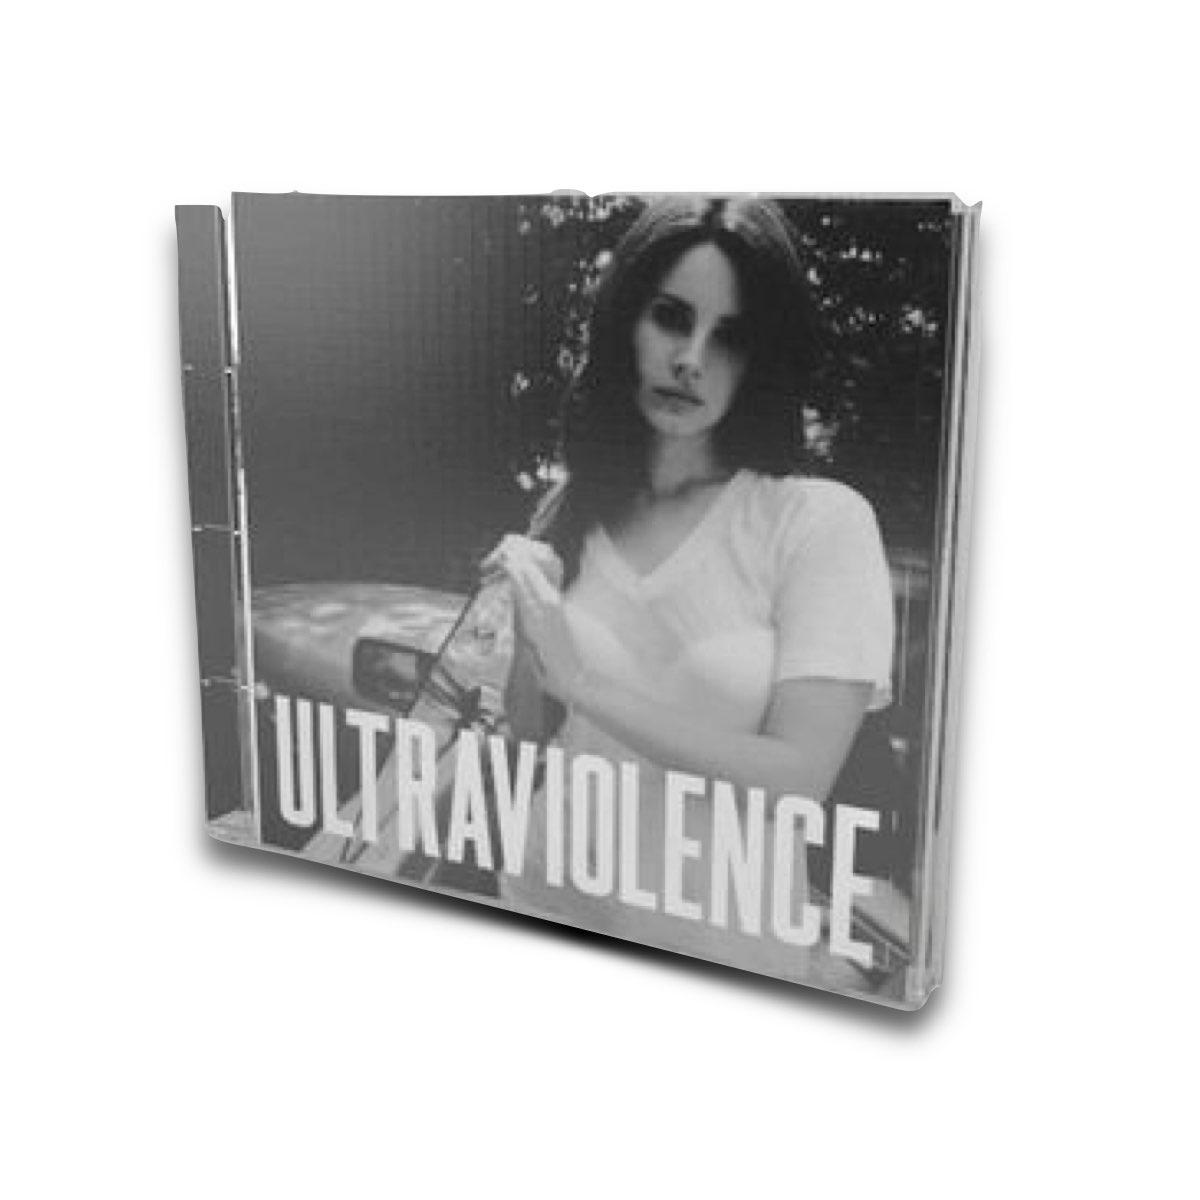 Lana Del Rey - Ultraviolence [CD Jewel Case - German Edition]